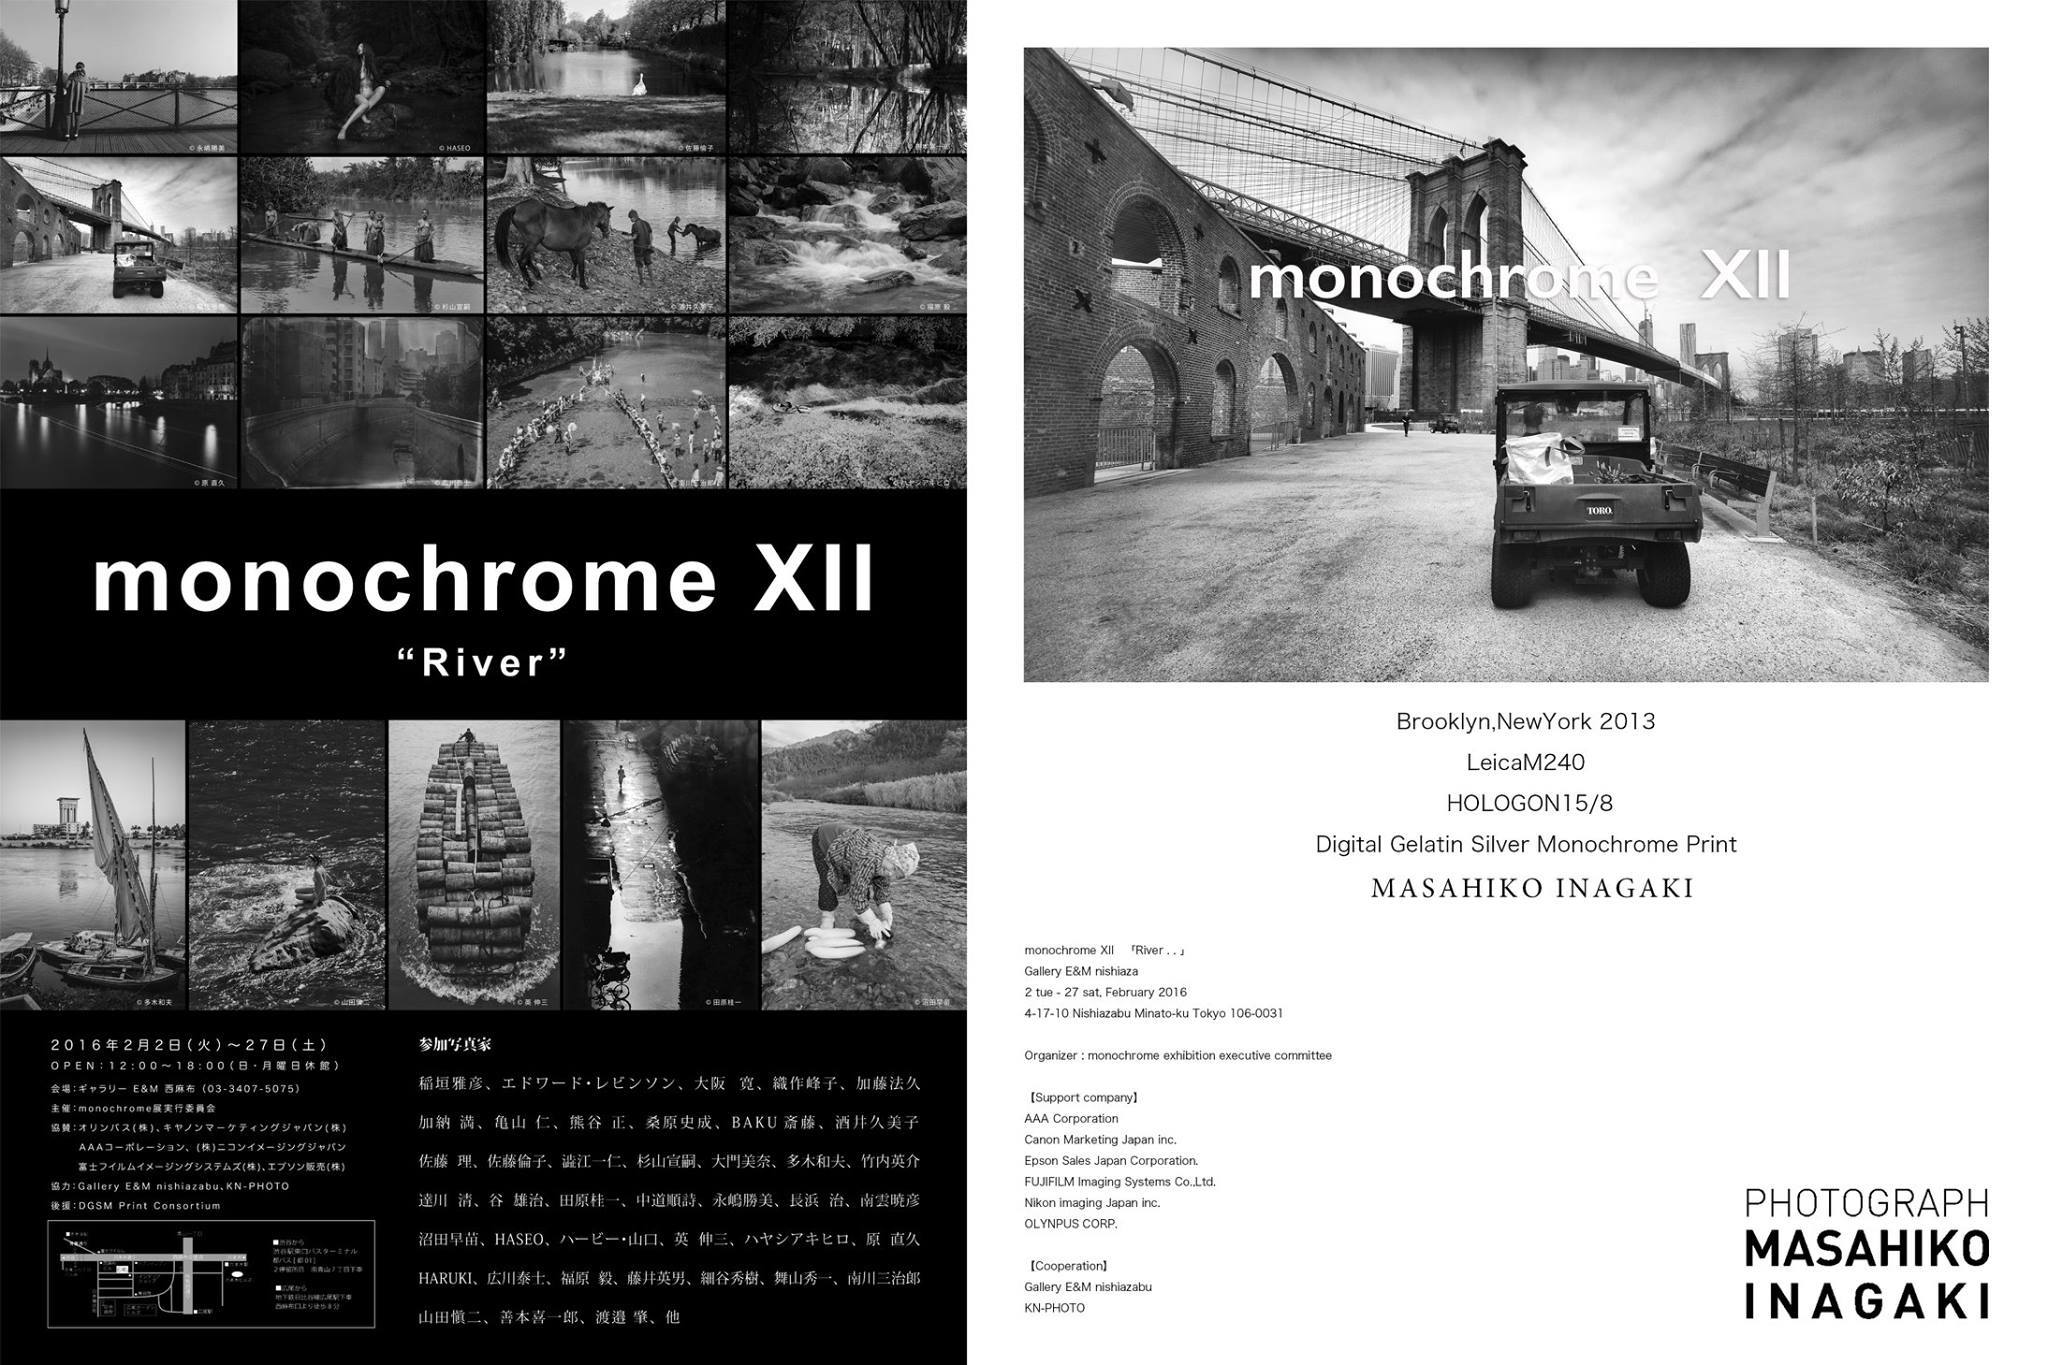 monochrome XII「River」